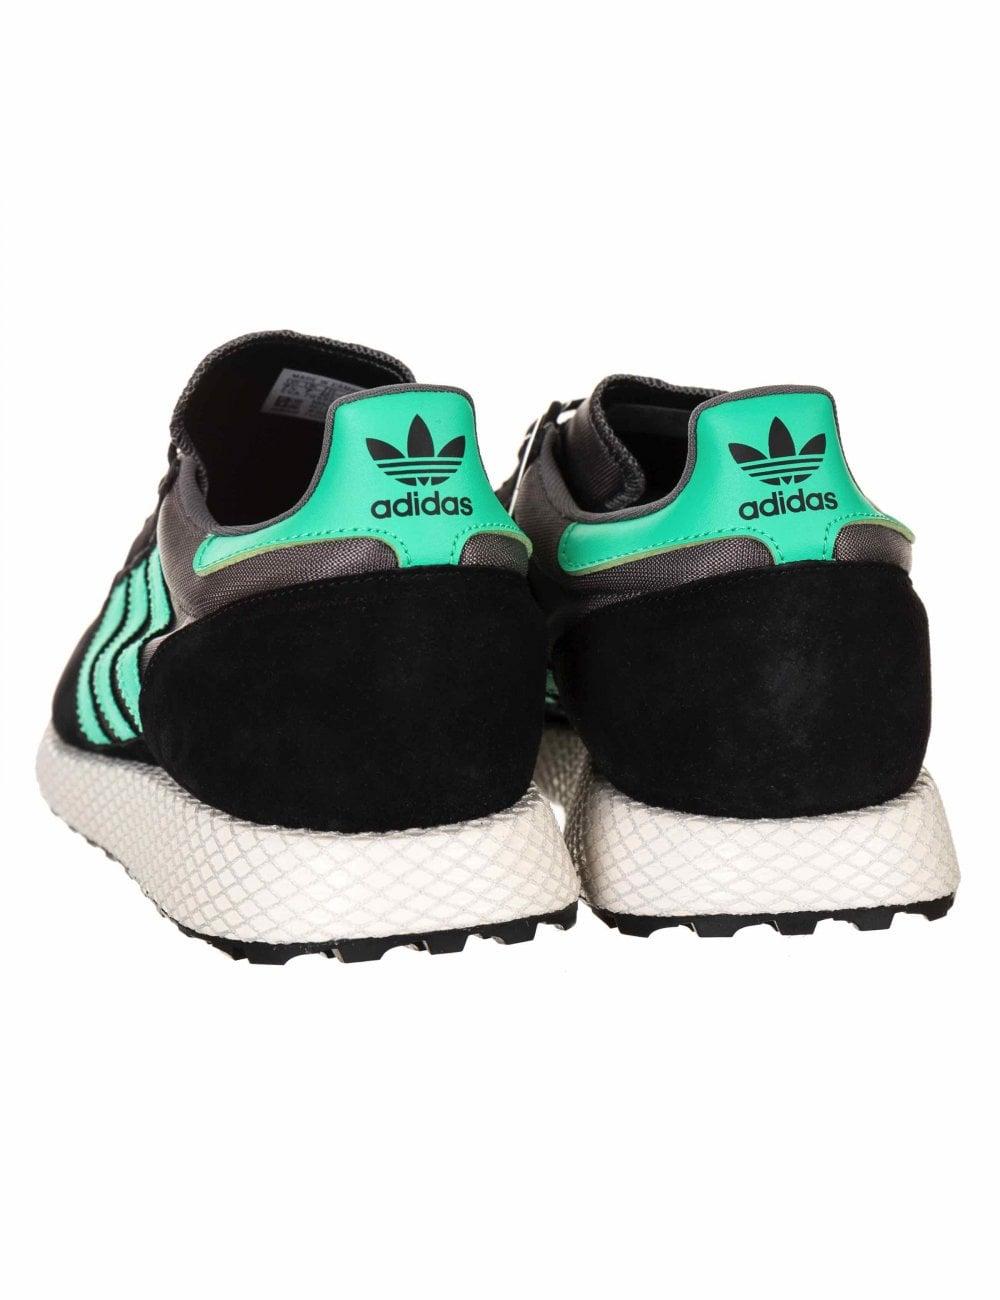 0b82ce3f279 Adidas Originals Forest Grove Trainers - Black Hi-Res Green ...